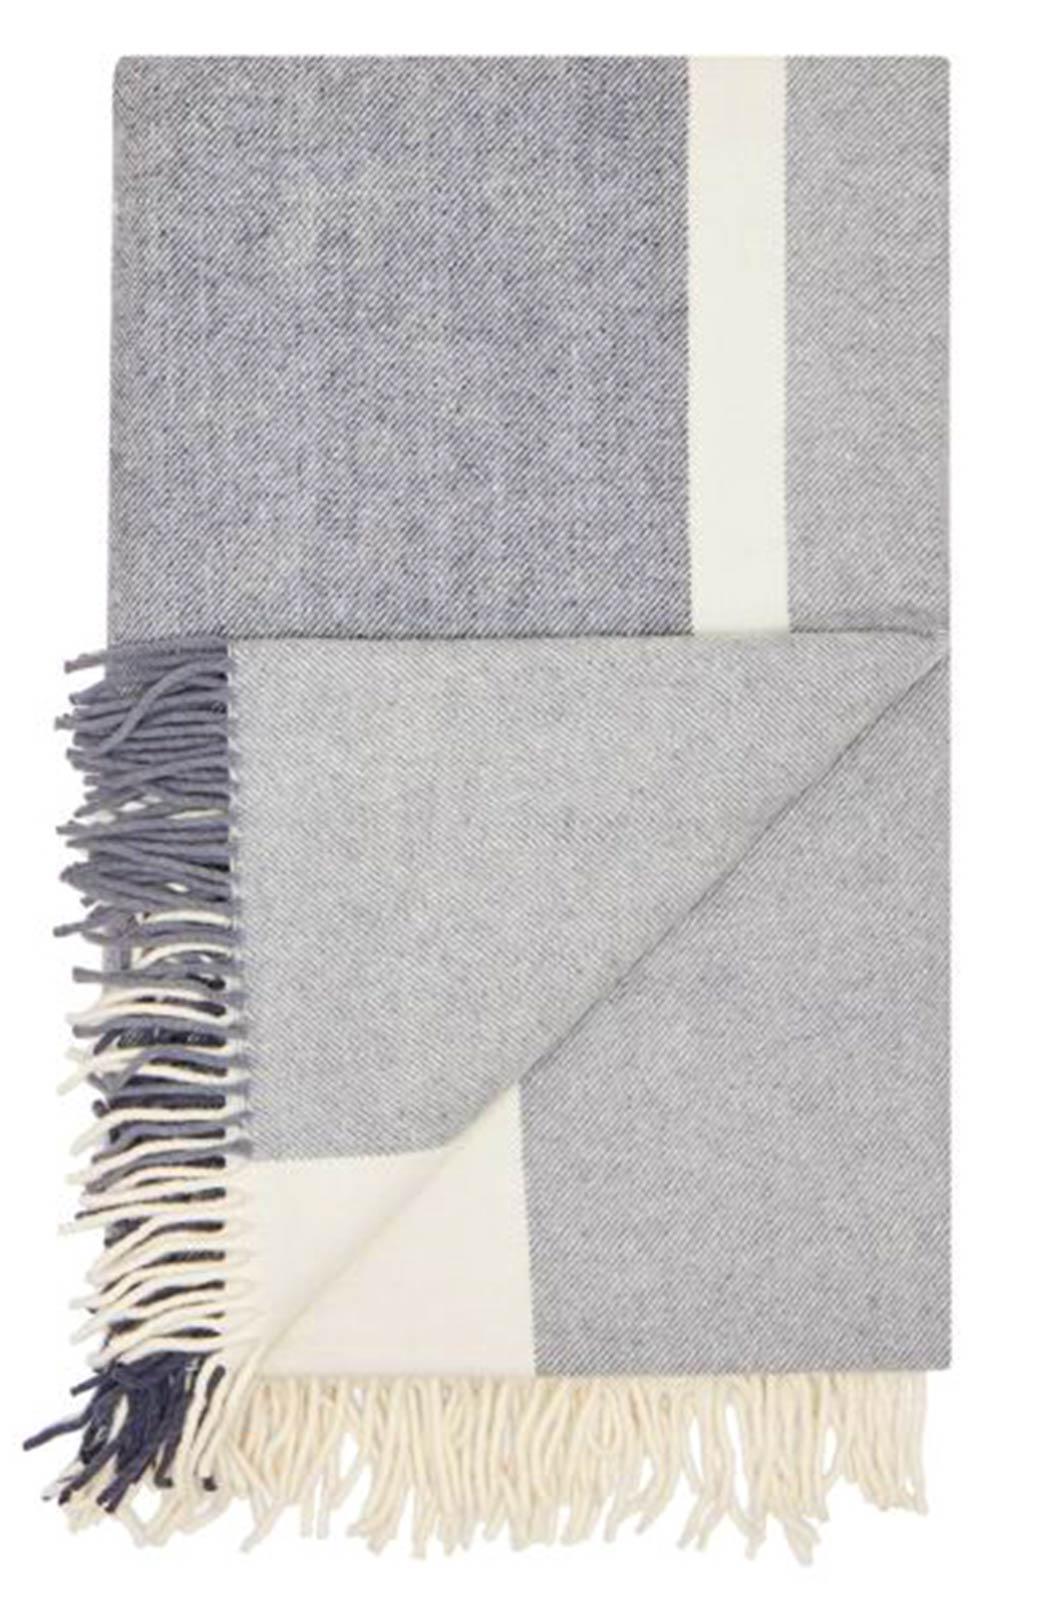 Merino Wool Throw Rug - Superfine Merino Wool Throw Rug Blanket - Smitten Merino Tasmania Australia